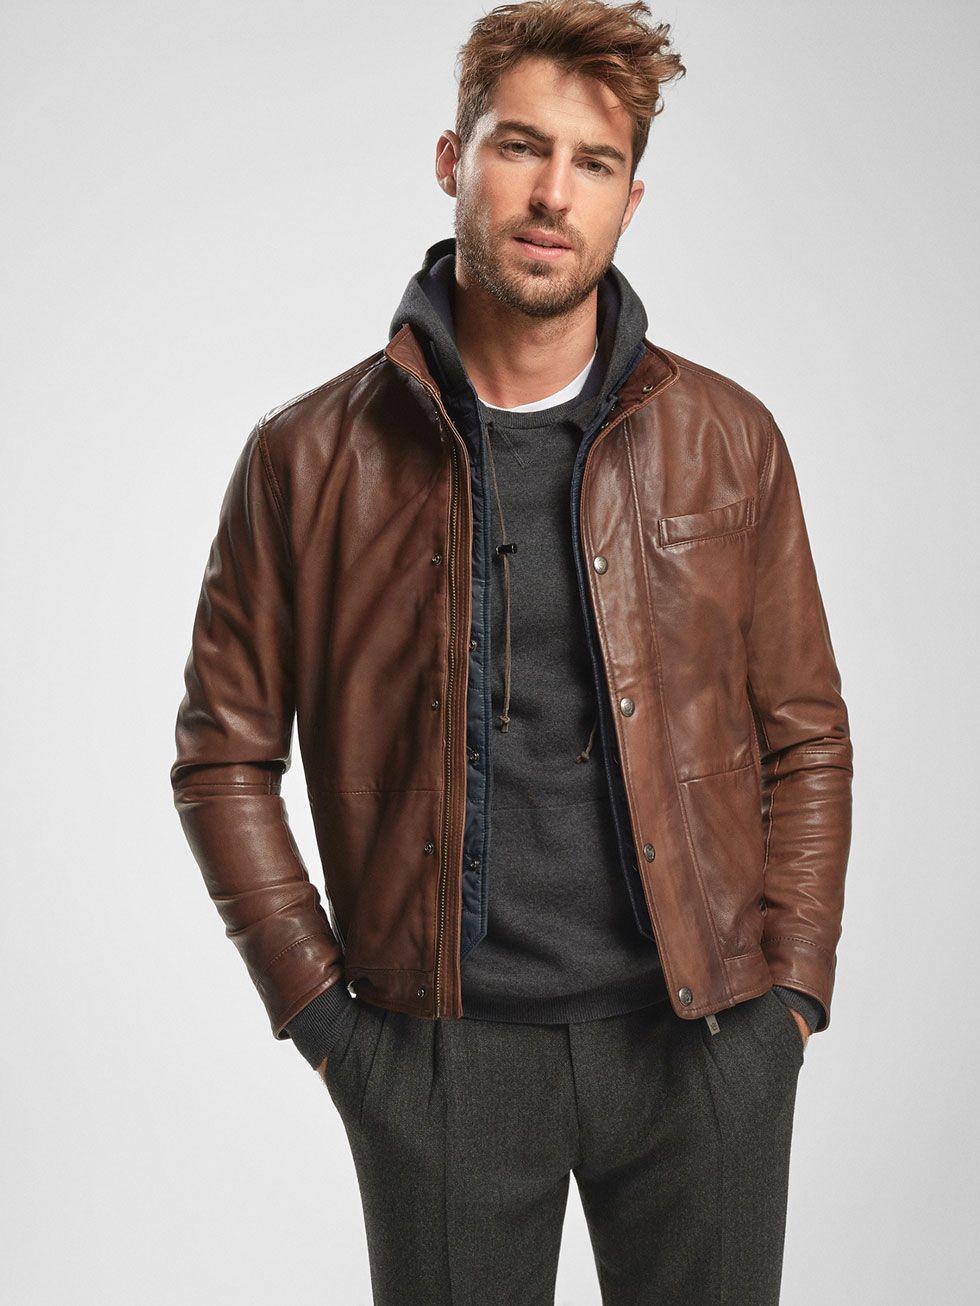 99a7f057f Leather jackets - MEN - Massimo Dutti | Kindled Spirit | Men's coats ...